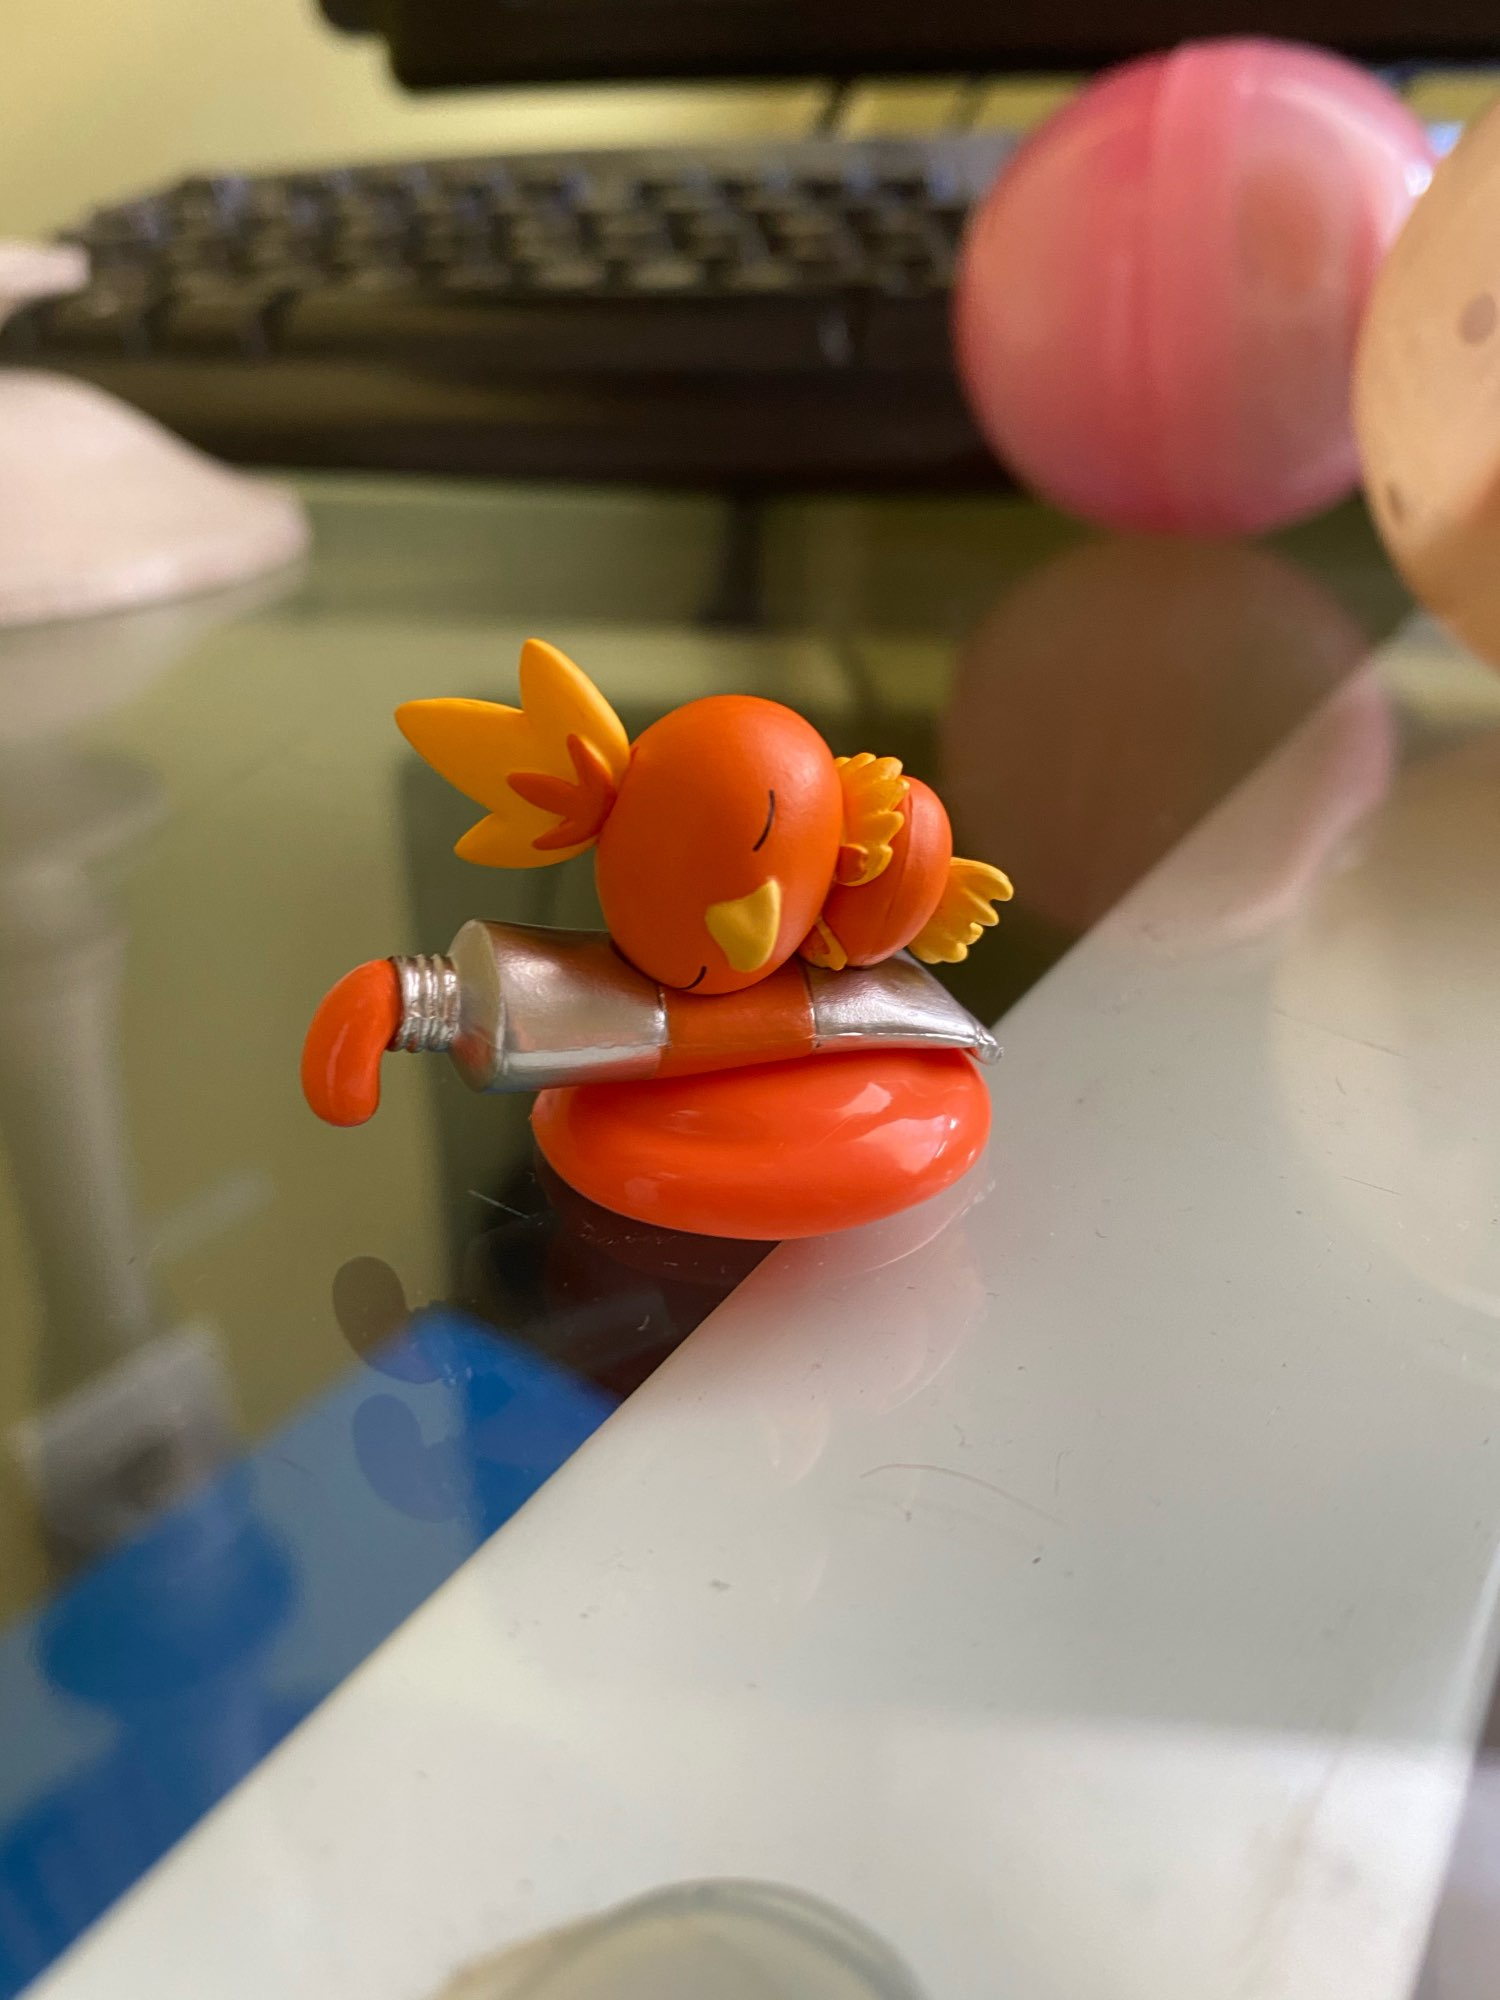 Pokemon Palette Riolu Squirtle Charmander Tangela Gengar Venusaur Chikorita Figure Action figure model toys for children photo review